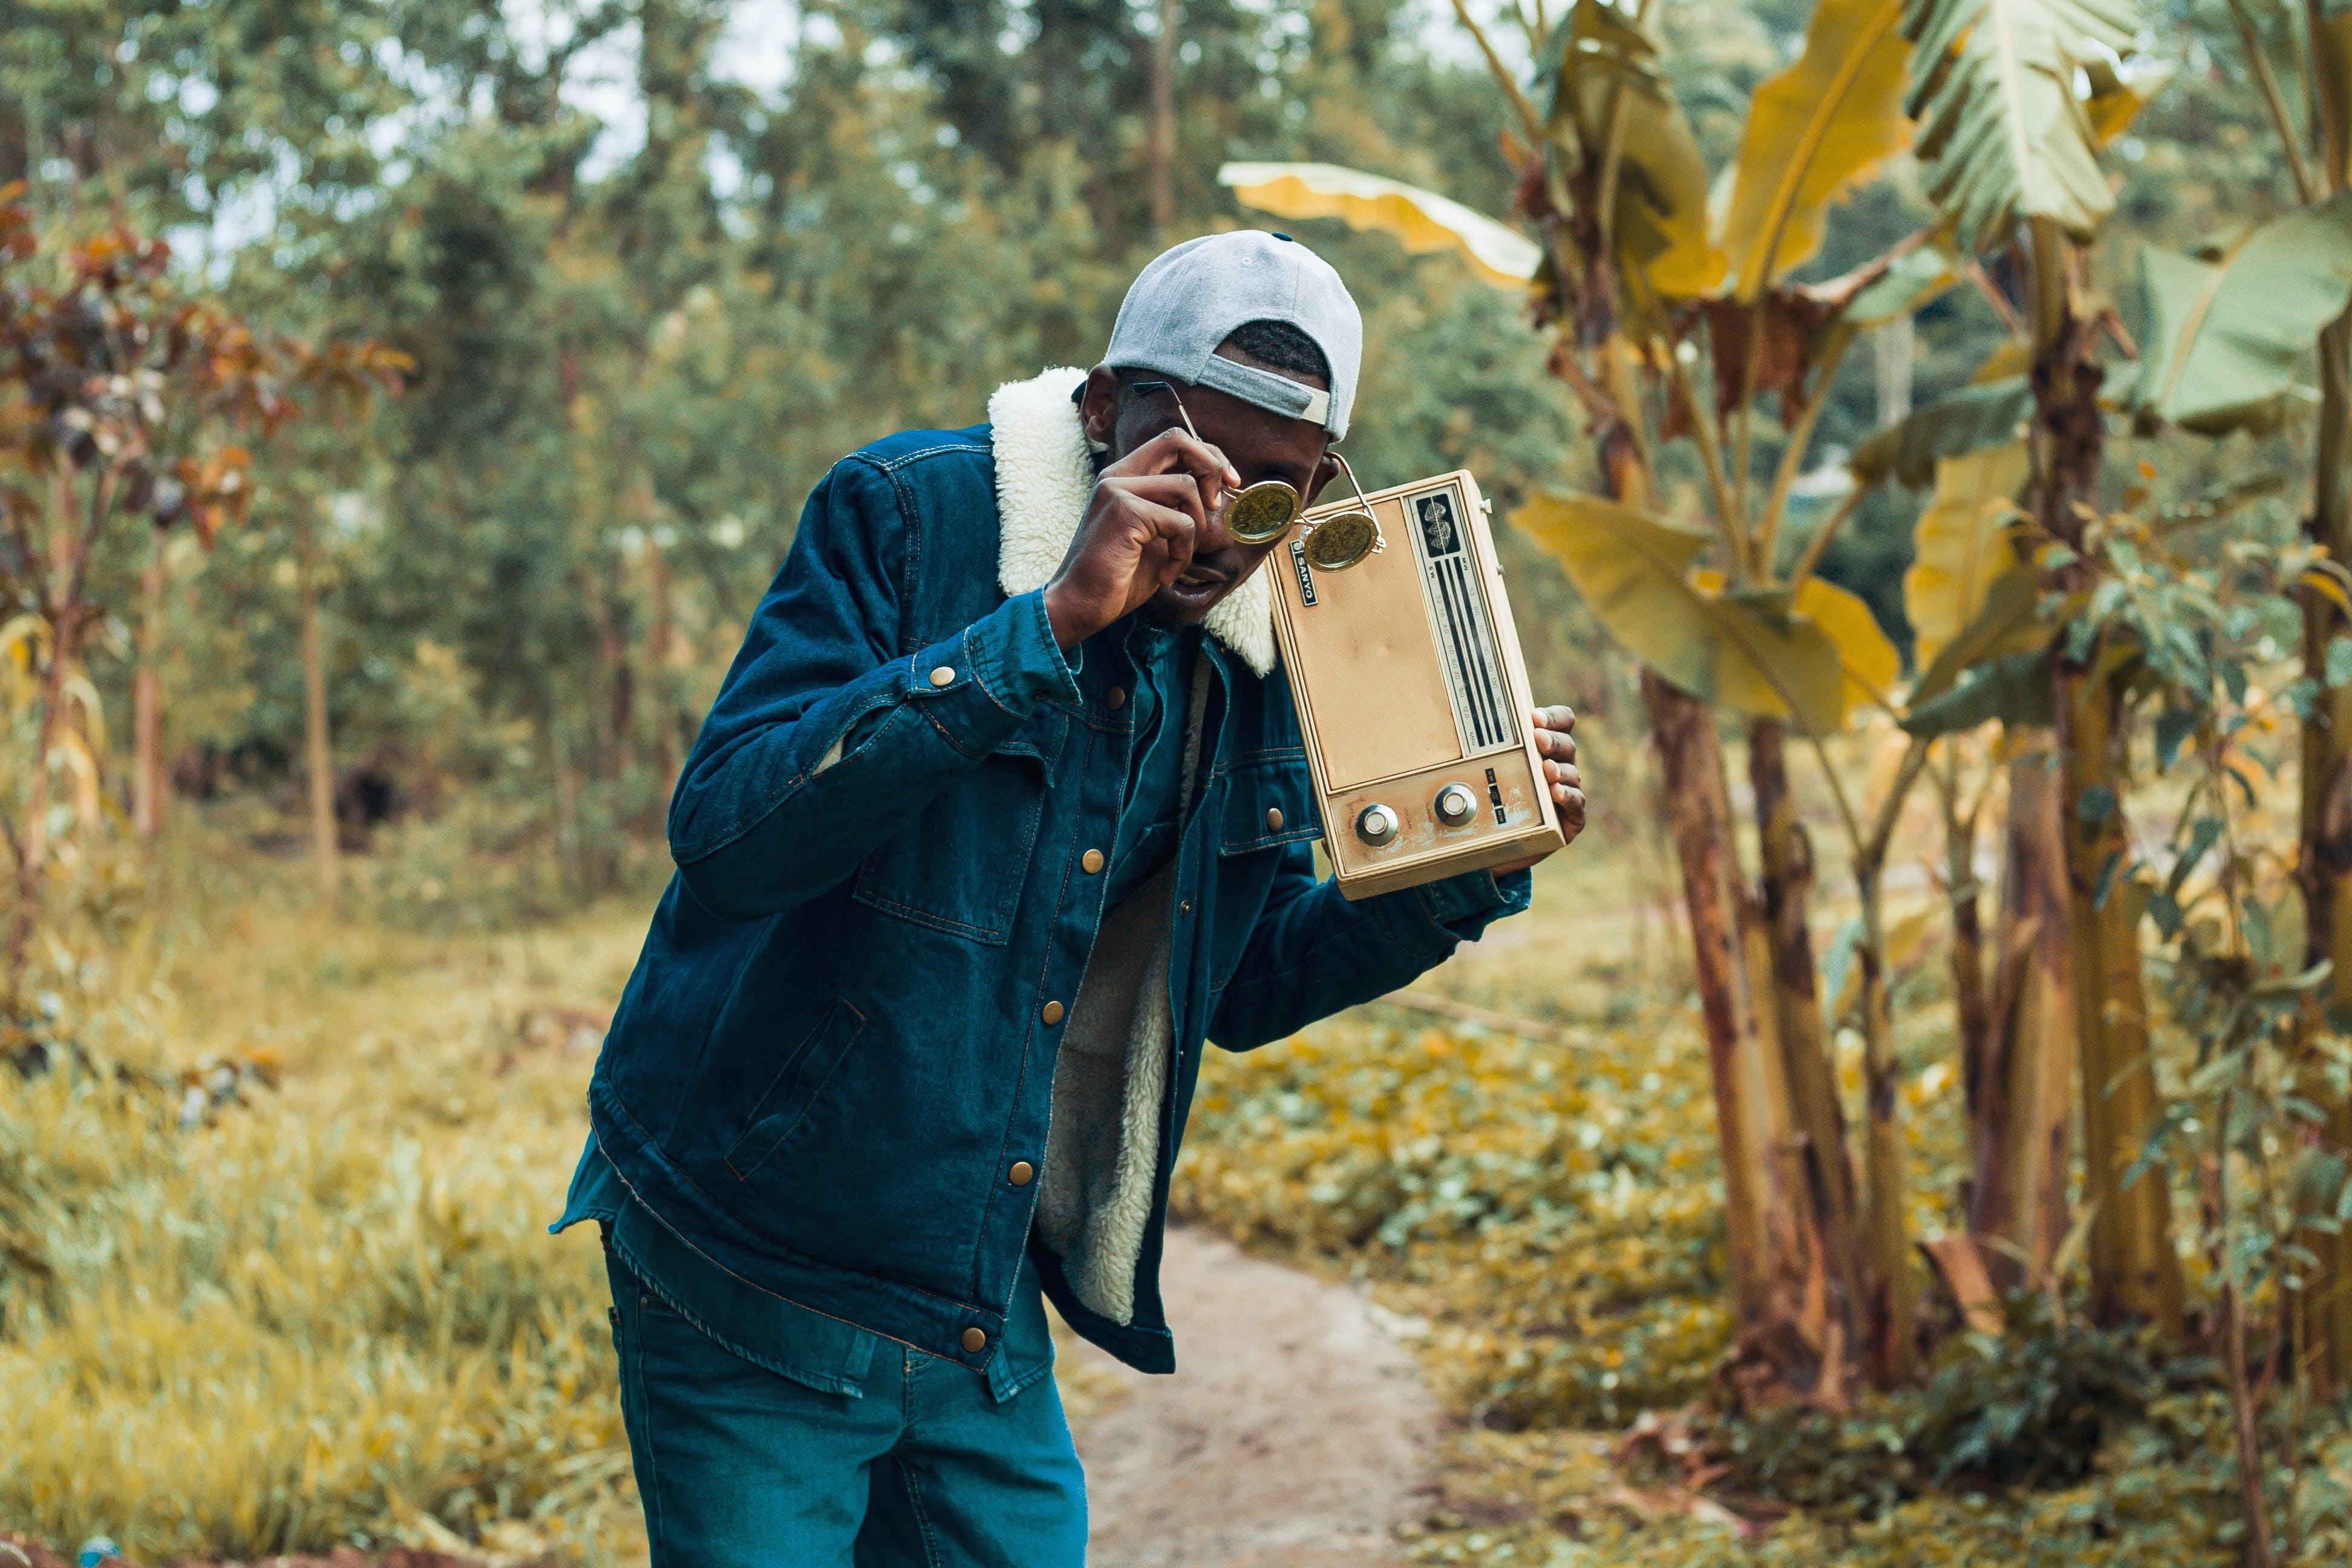 Man Holding Brown Boombox Radio